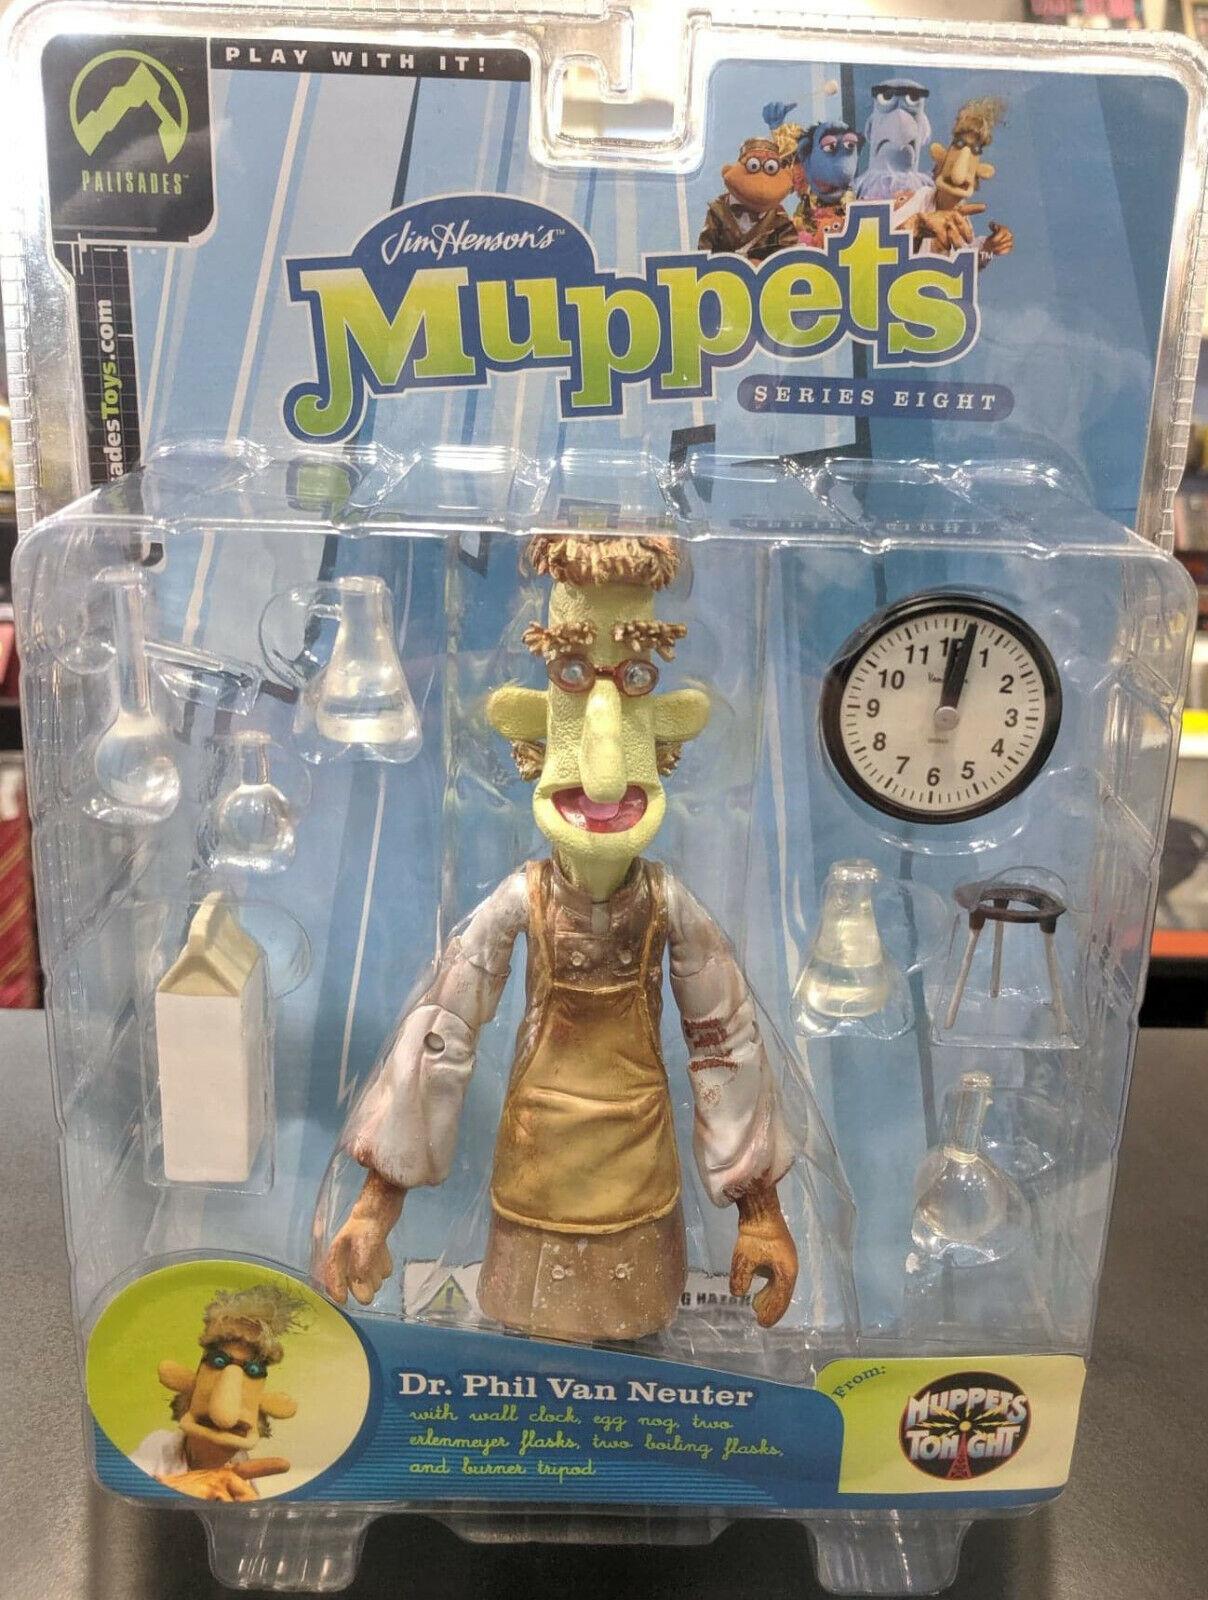 MUPPETS Palisades DR PHIL VAN NEUTER Action Figur Series 8 MUPPETS TONGEN